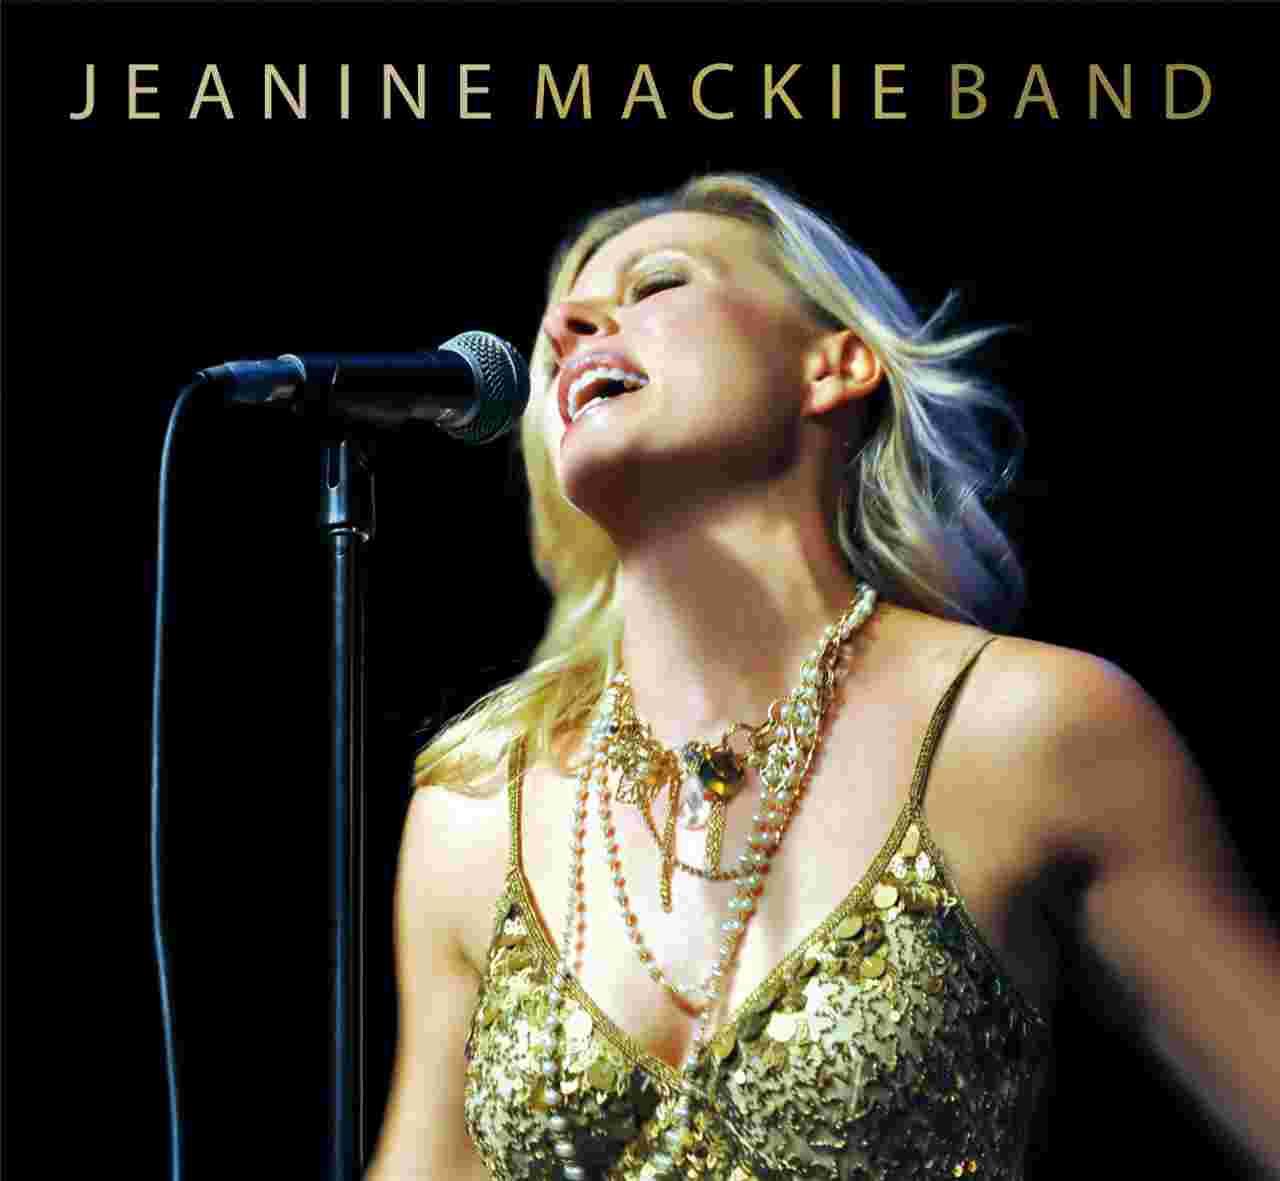 Jeanine Mackie